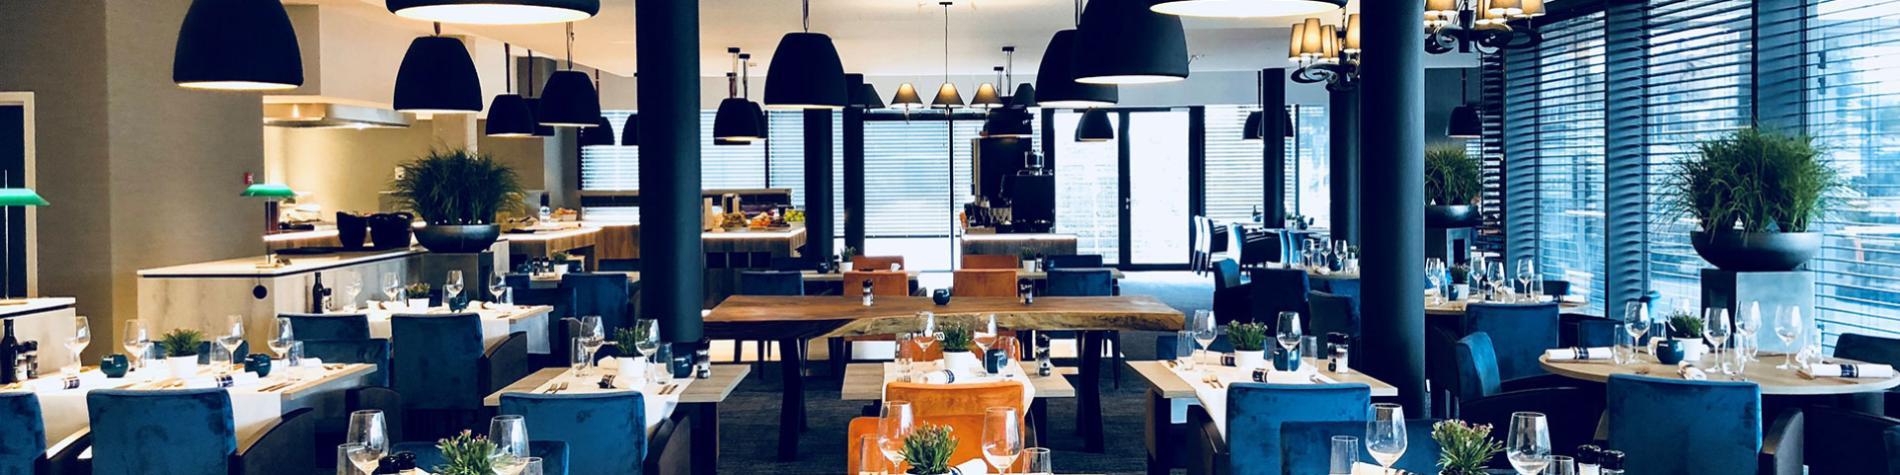 Hôtel - restaurant - Van der Valk - Liège Congrès